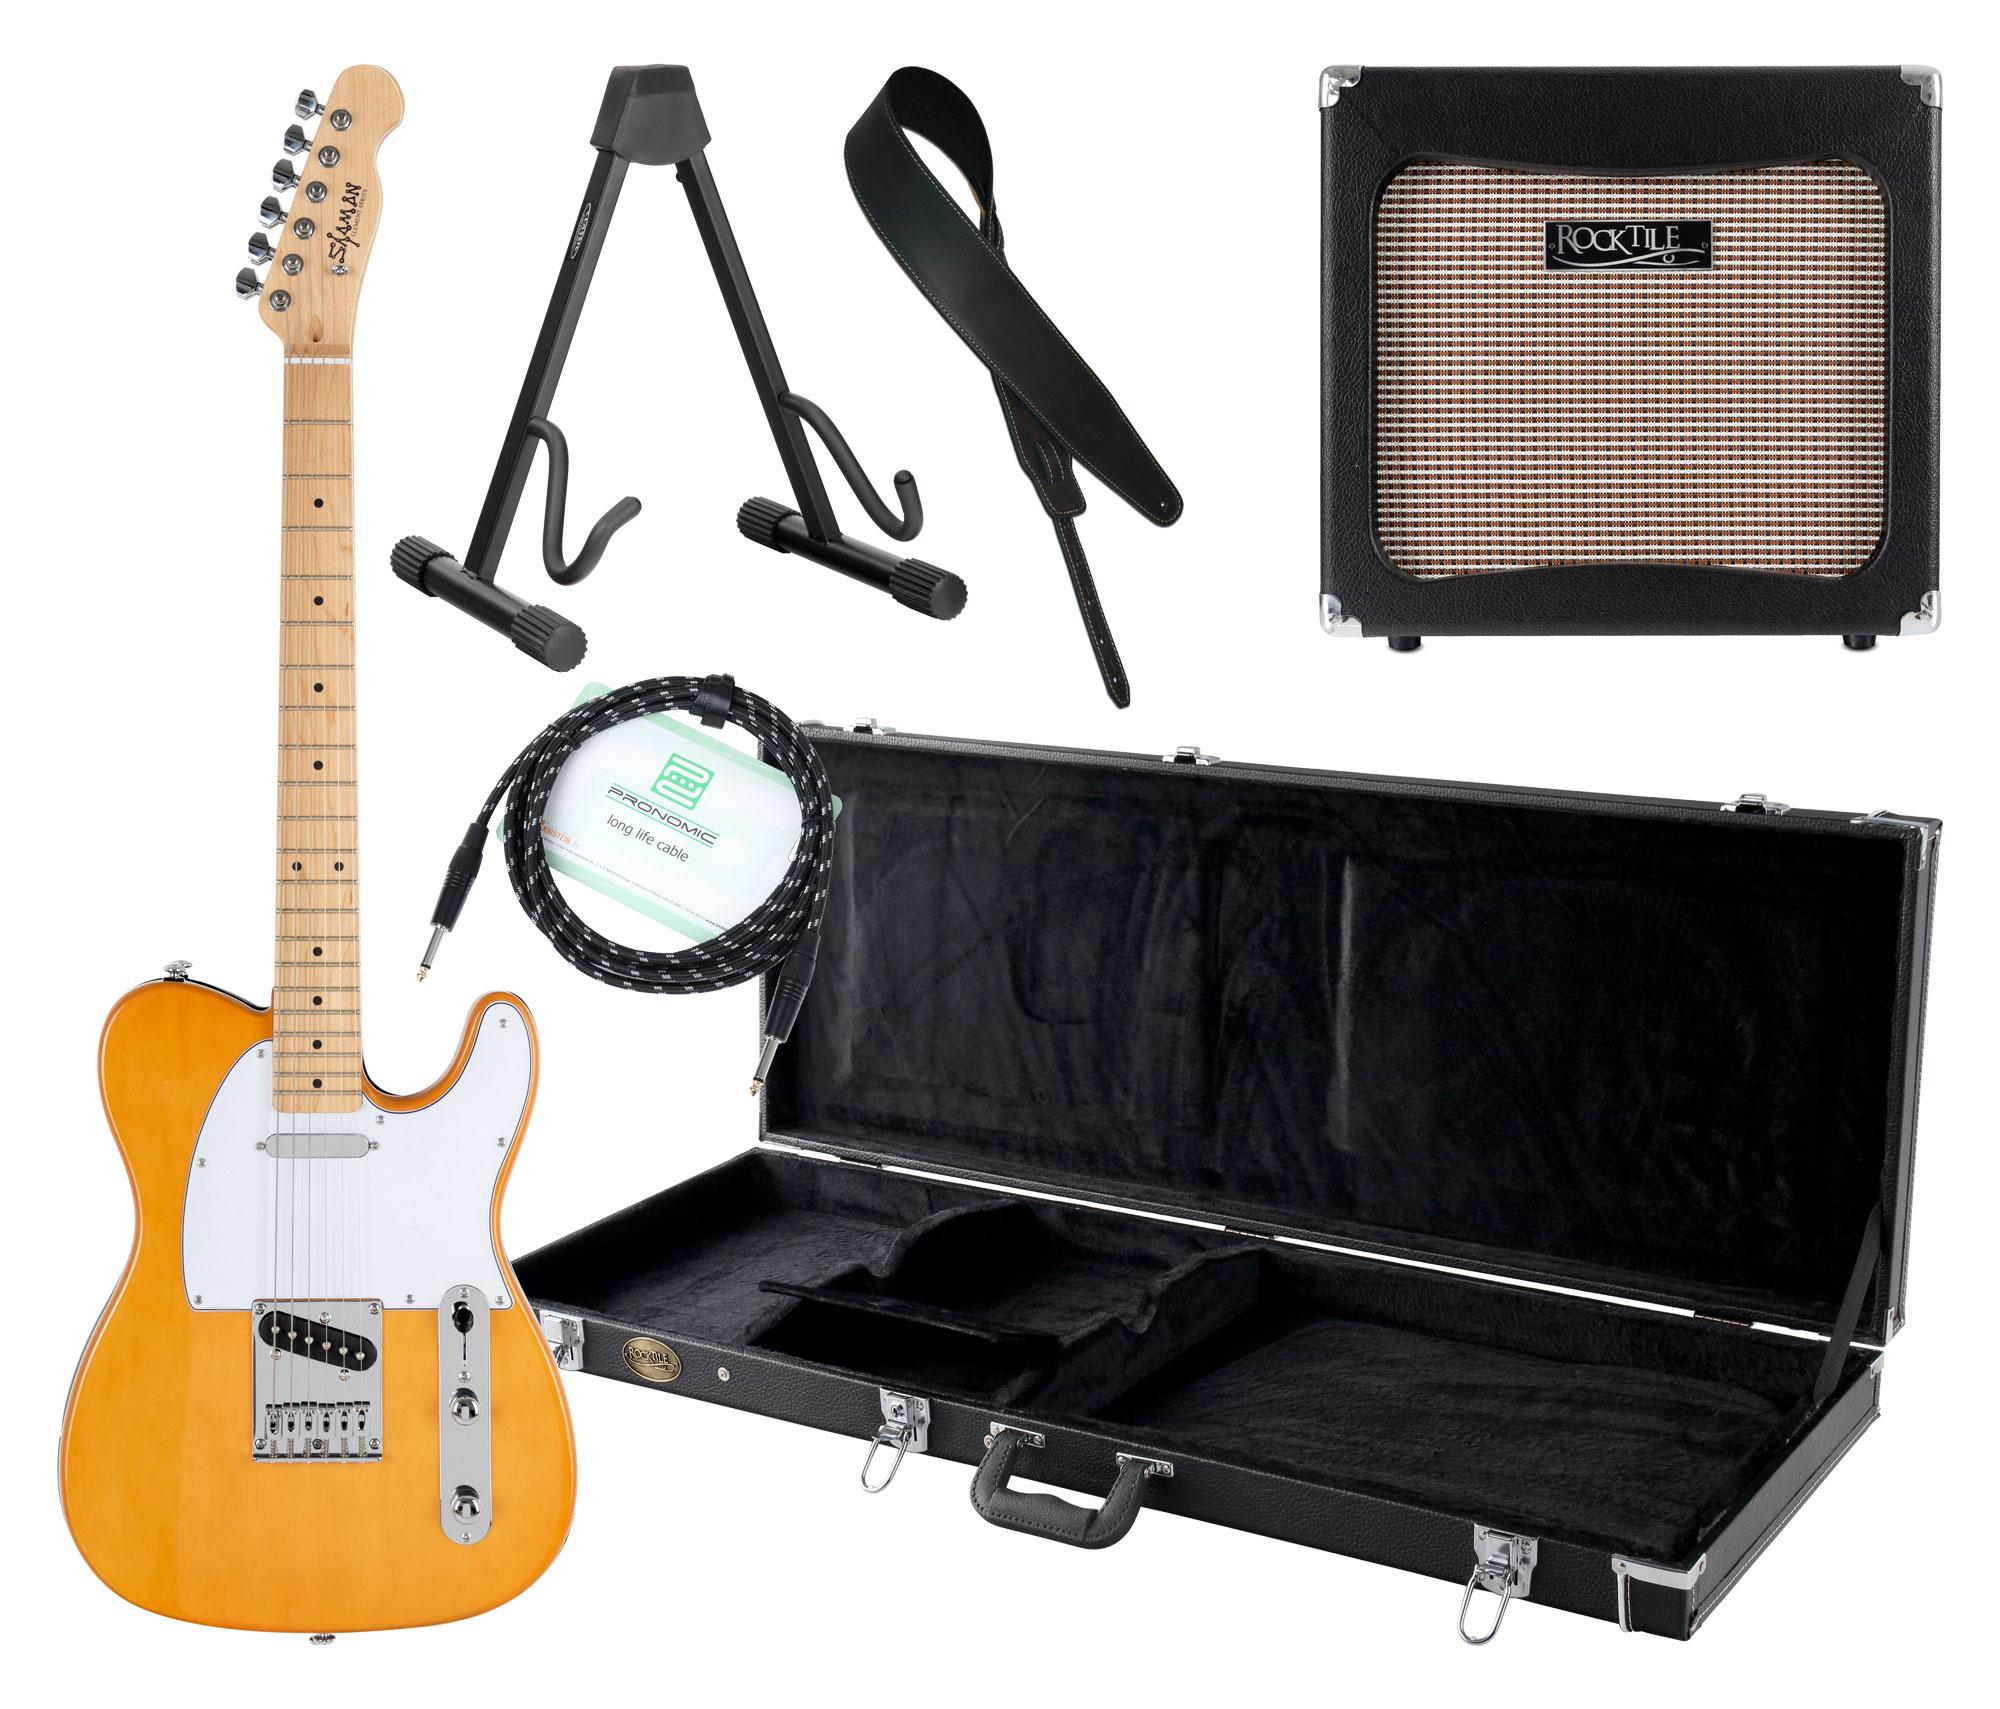 Egitarren - Shaman Element Series TCX 100BL Komplett Set - Onlineshop Musikhaus Kirstein